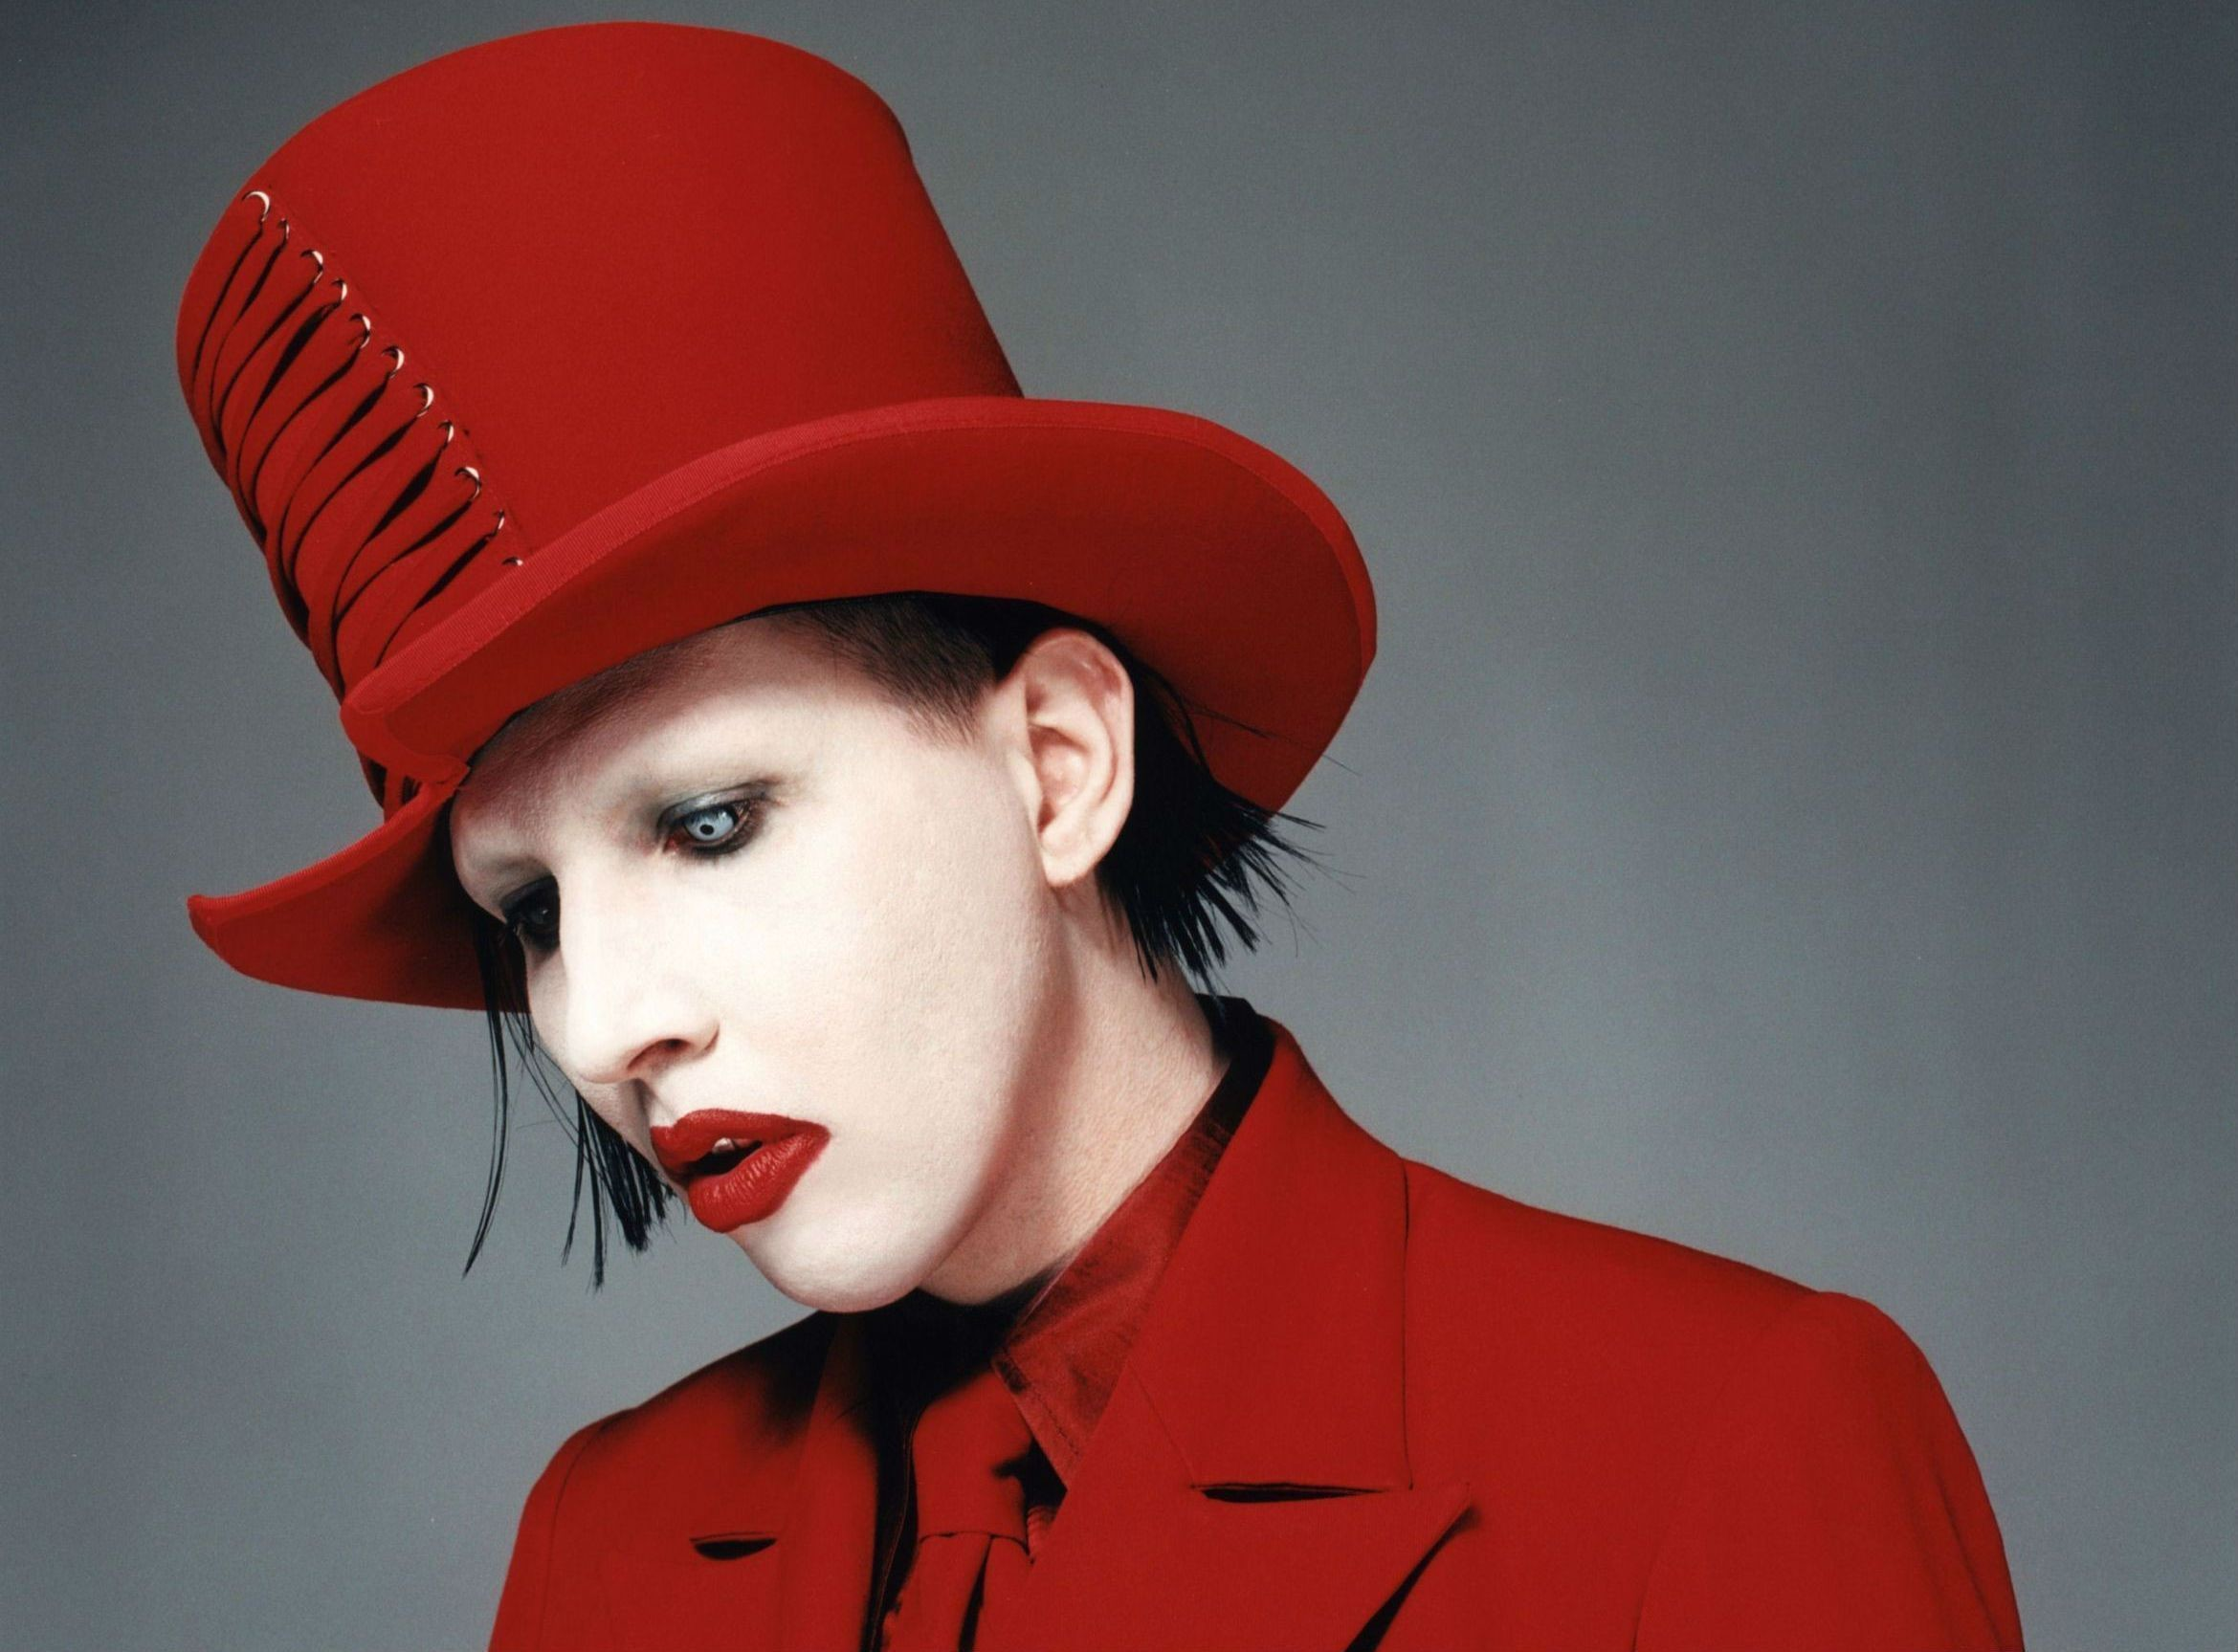 HD Quality Marilyn Manson Wallpaper 12 Music Celebrity Full Size .